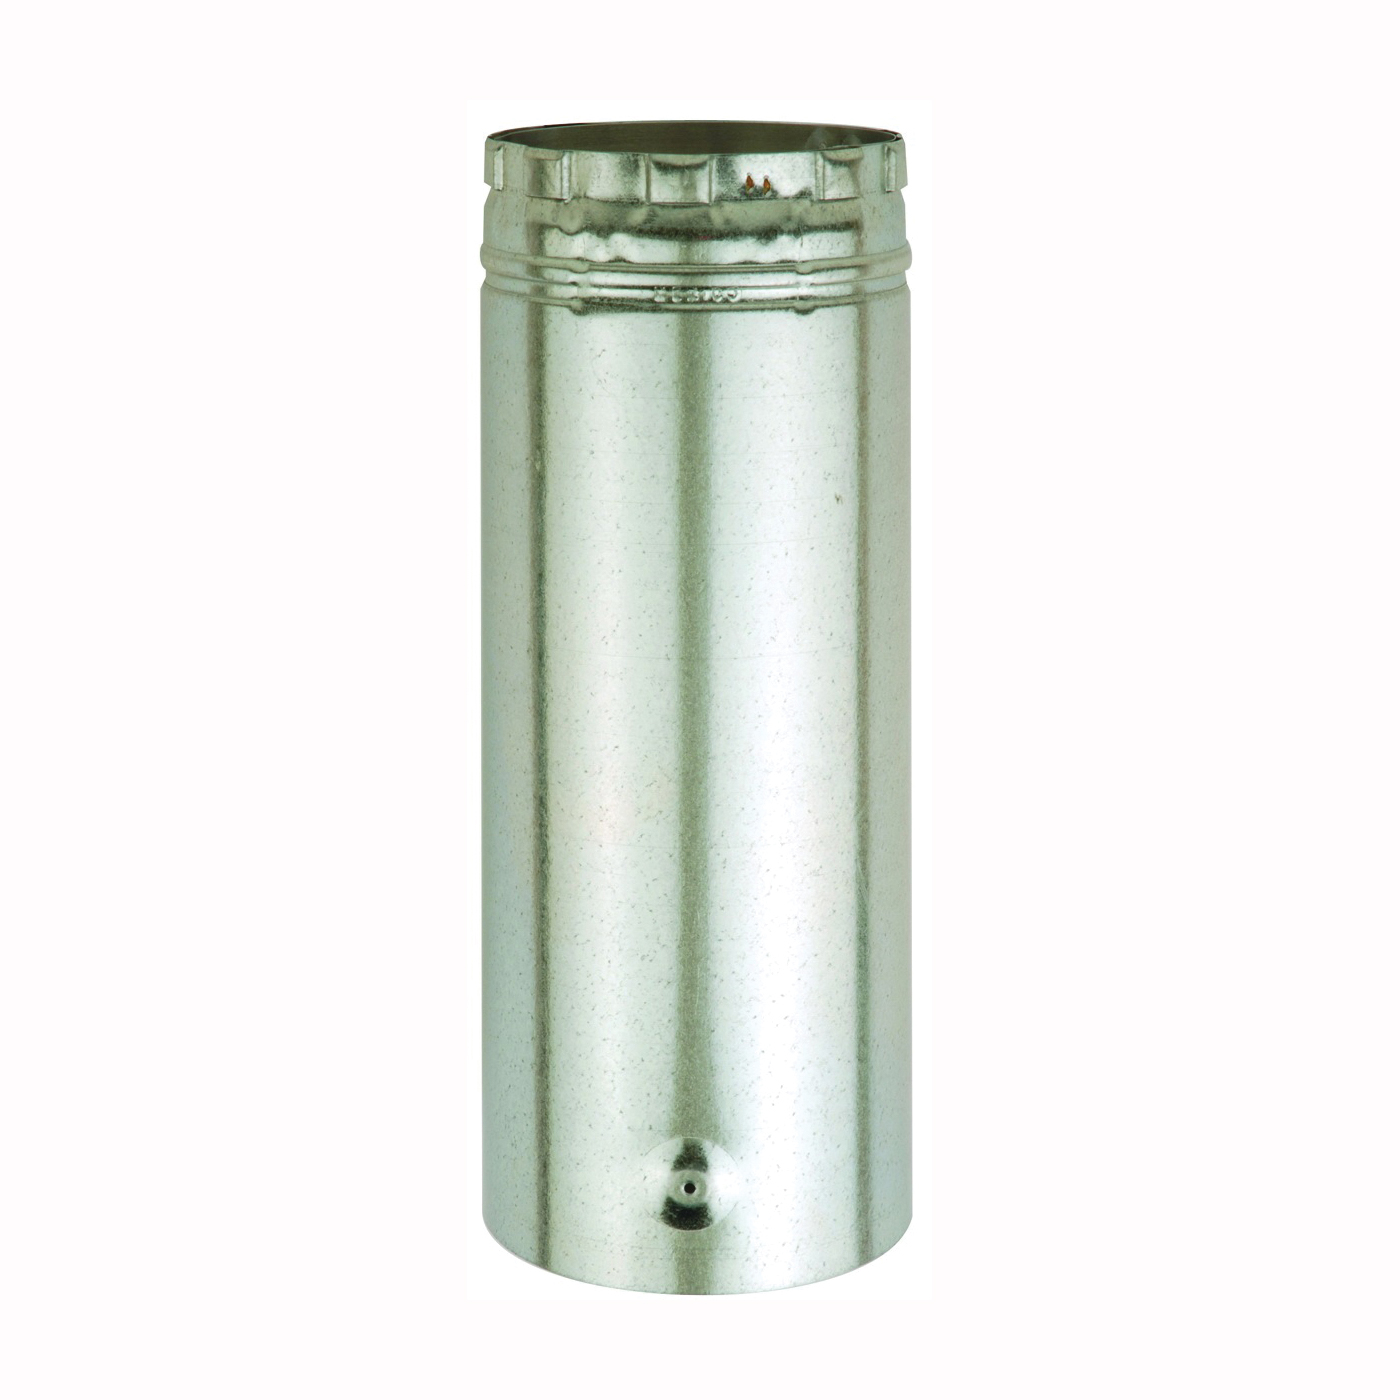 Picture of AmeriVent 3E12A Type B Gas Vent Pipe, 3 in OD, 12 in L, Aluminum/Galvanized Steel, Brass